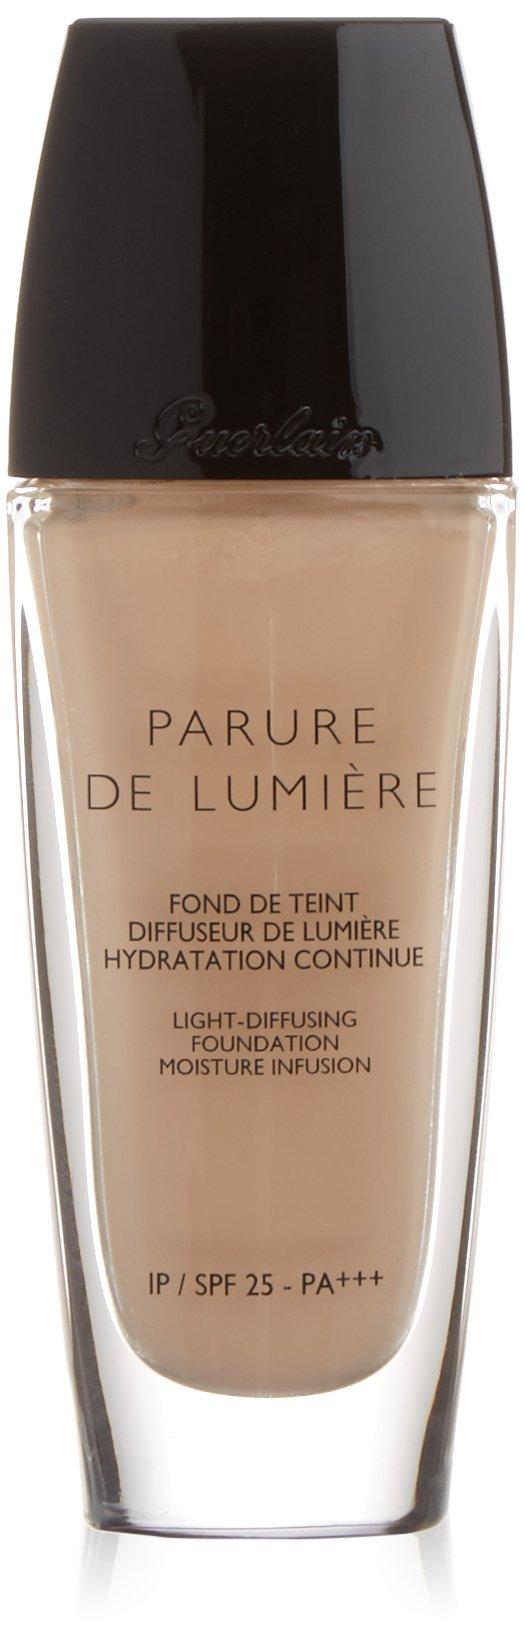 Guerlain Parure De Lumiere Light Diffusing Foundation SPF 25, # 02 Beige Clair, 1 Ounce